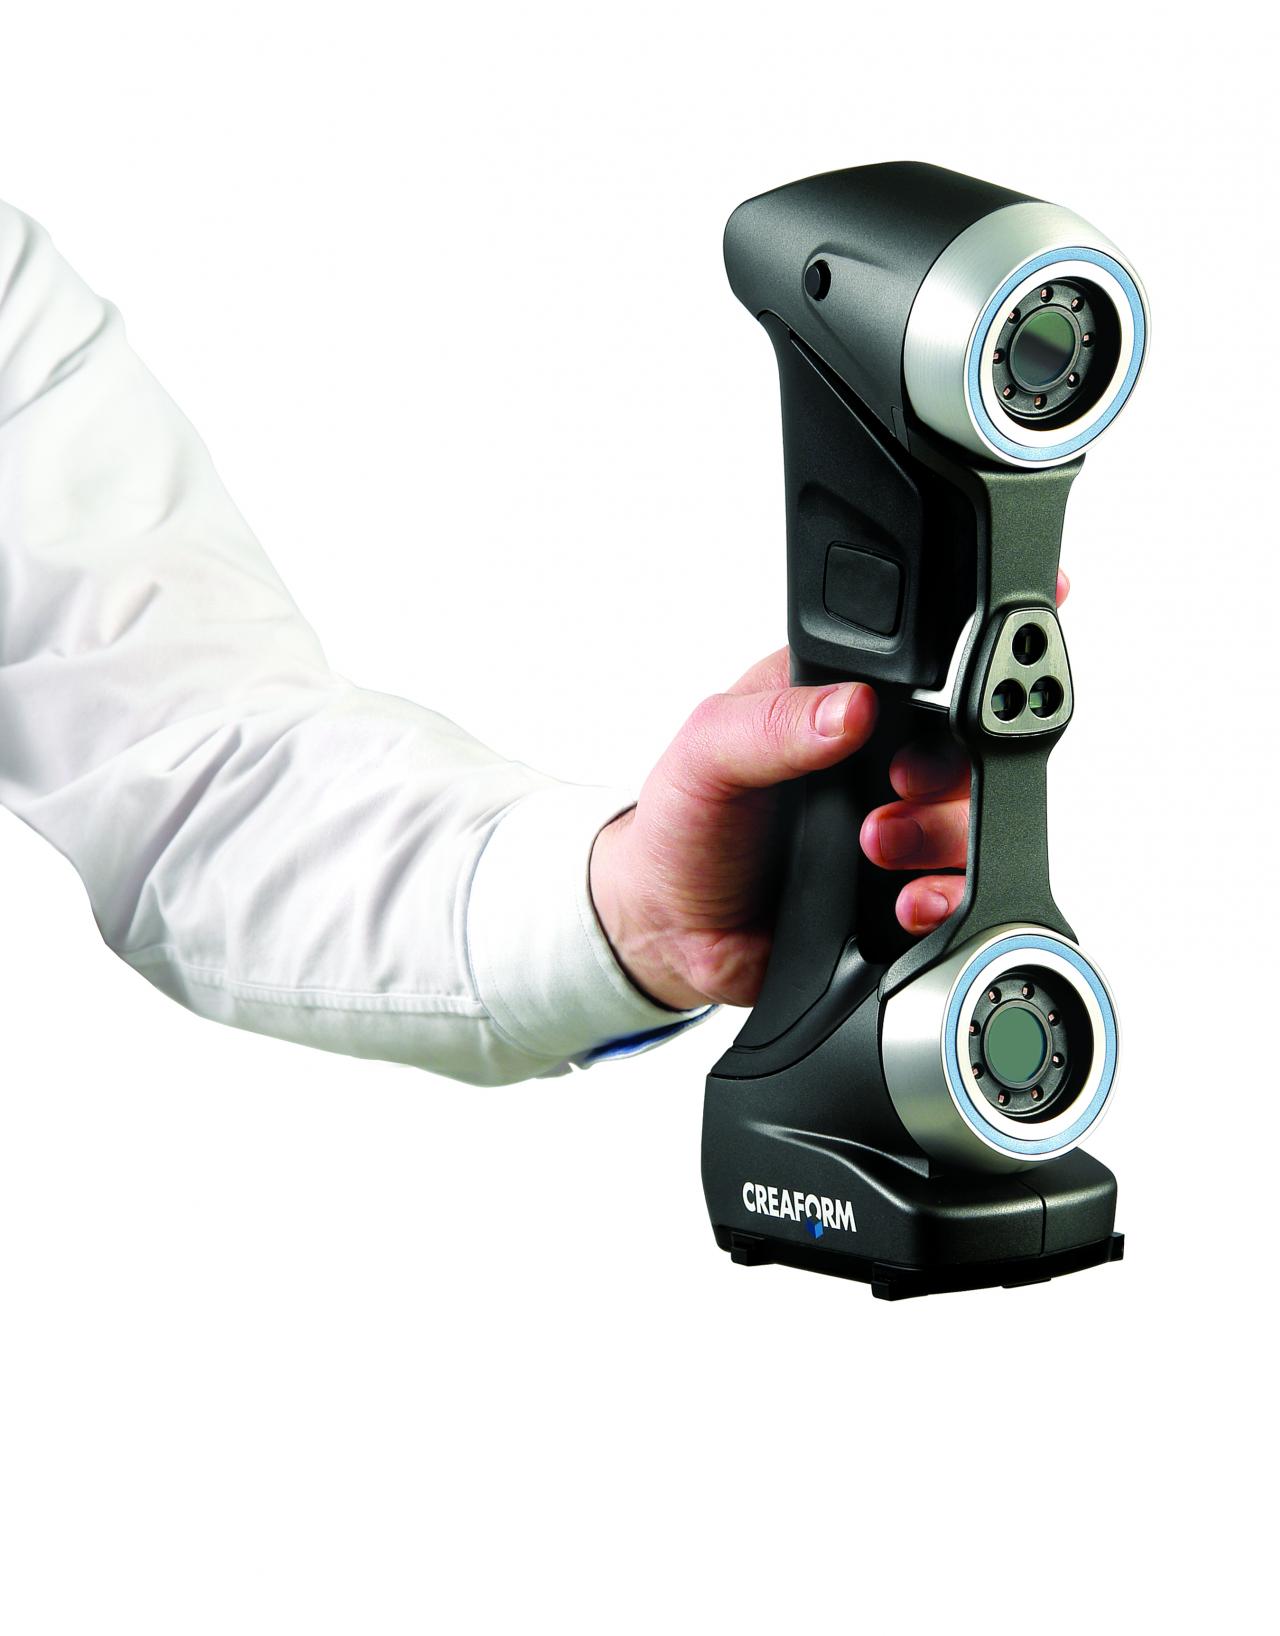 HandySCAN 3D (휴대용 3D 레이저 스캐너)